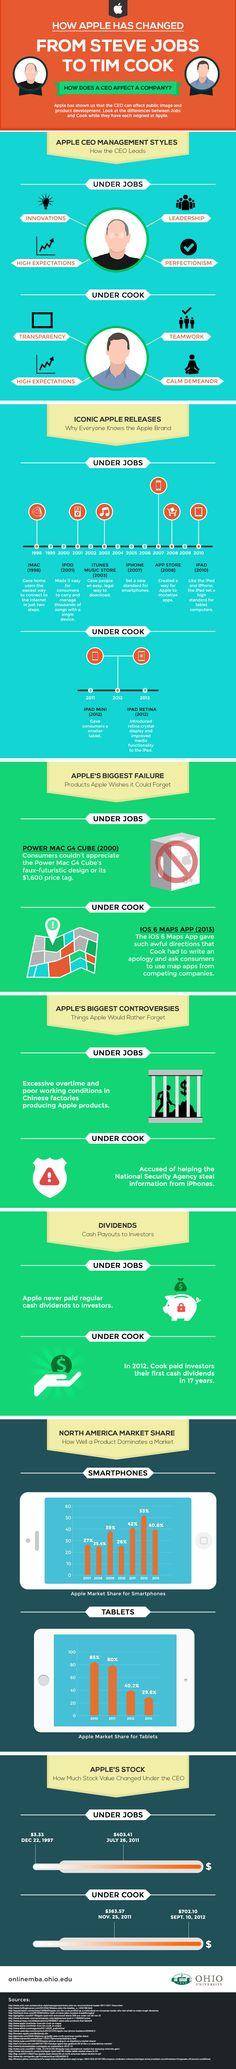 Apples to Apples: Steve Jobs vs. Tim Cook #Infographic